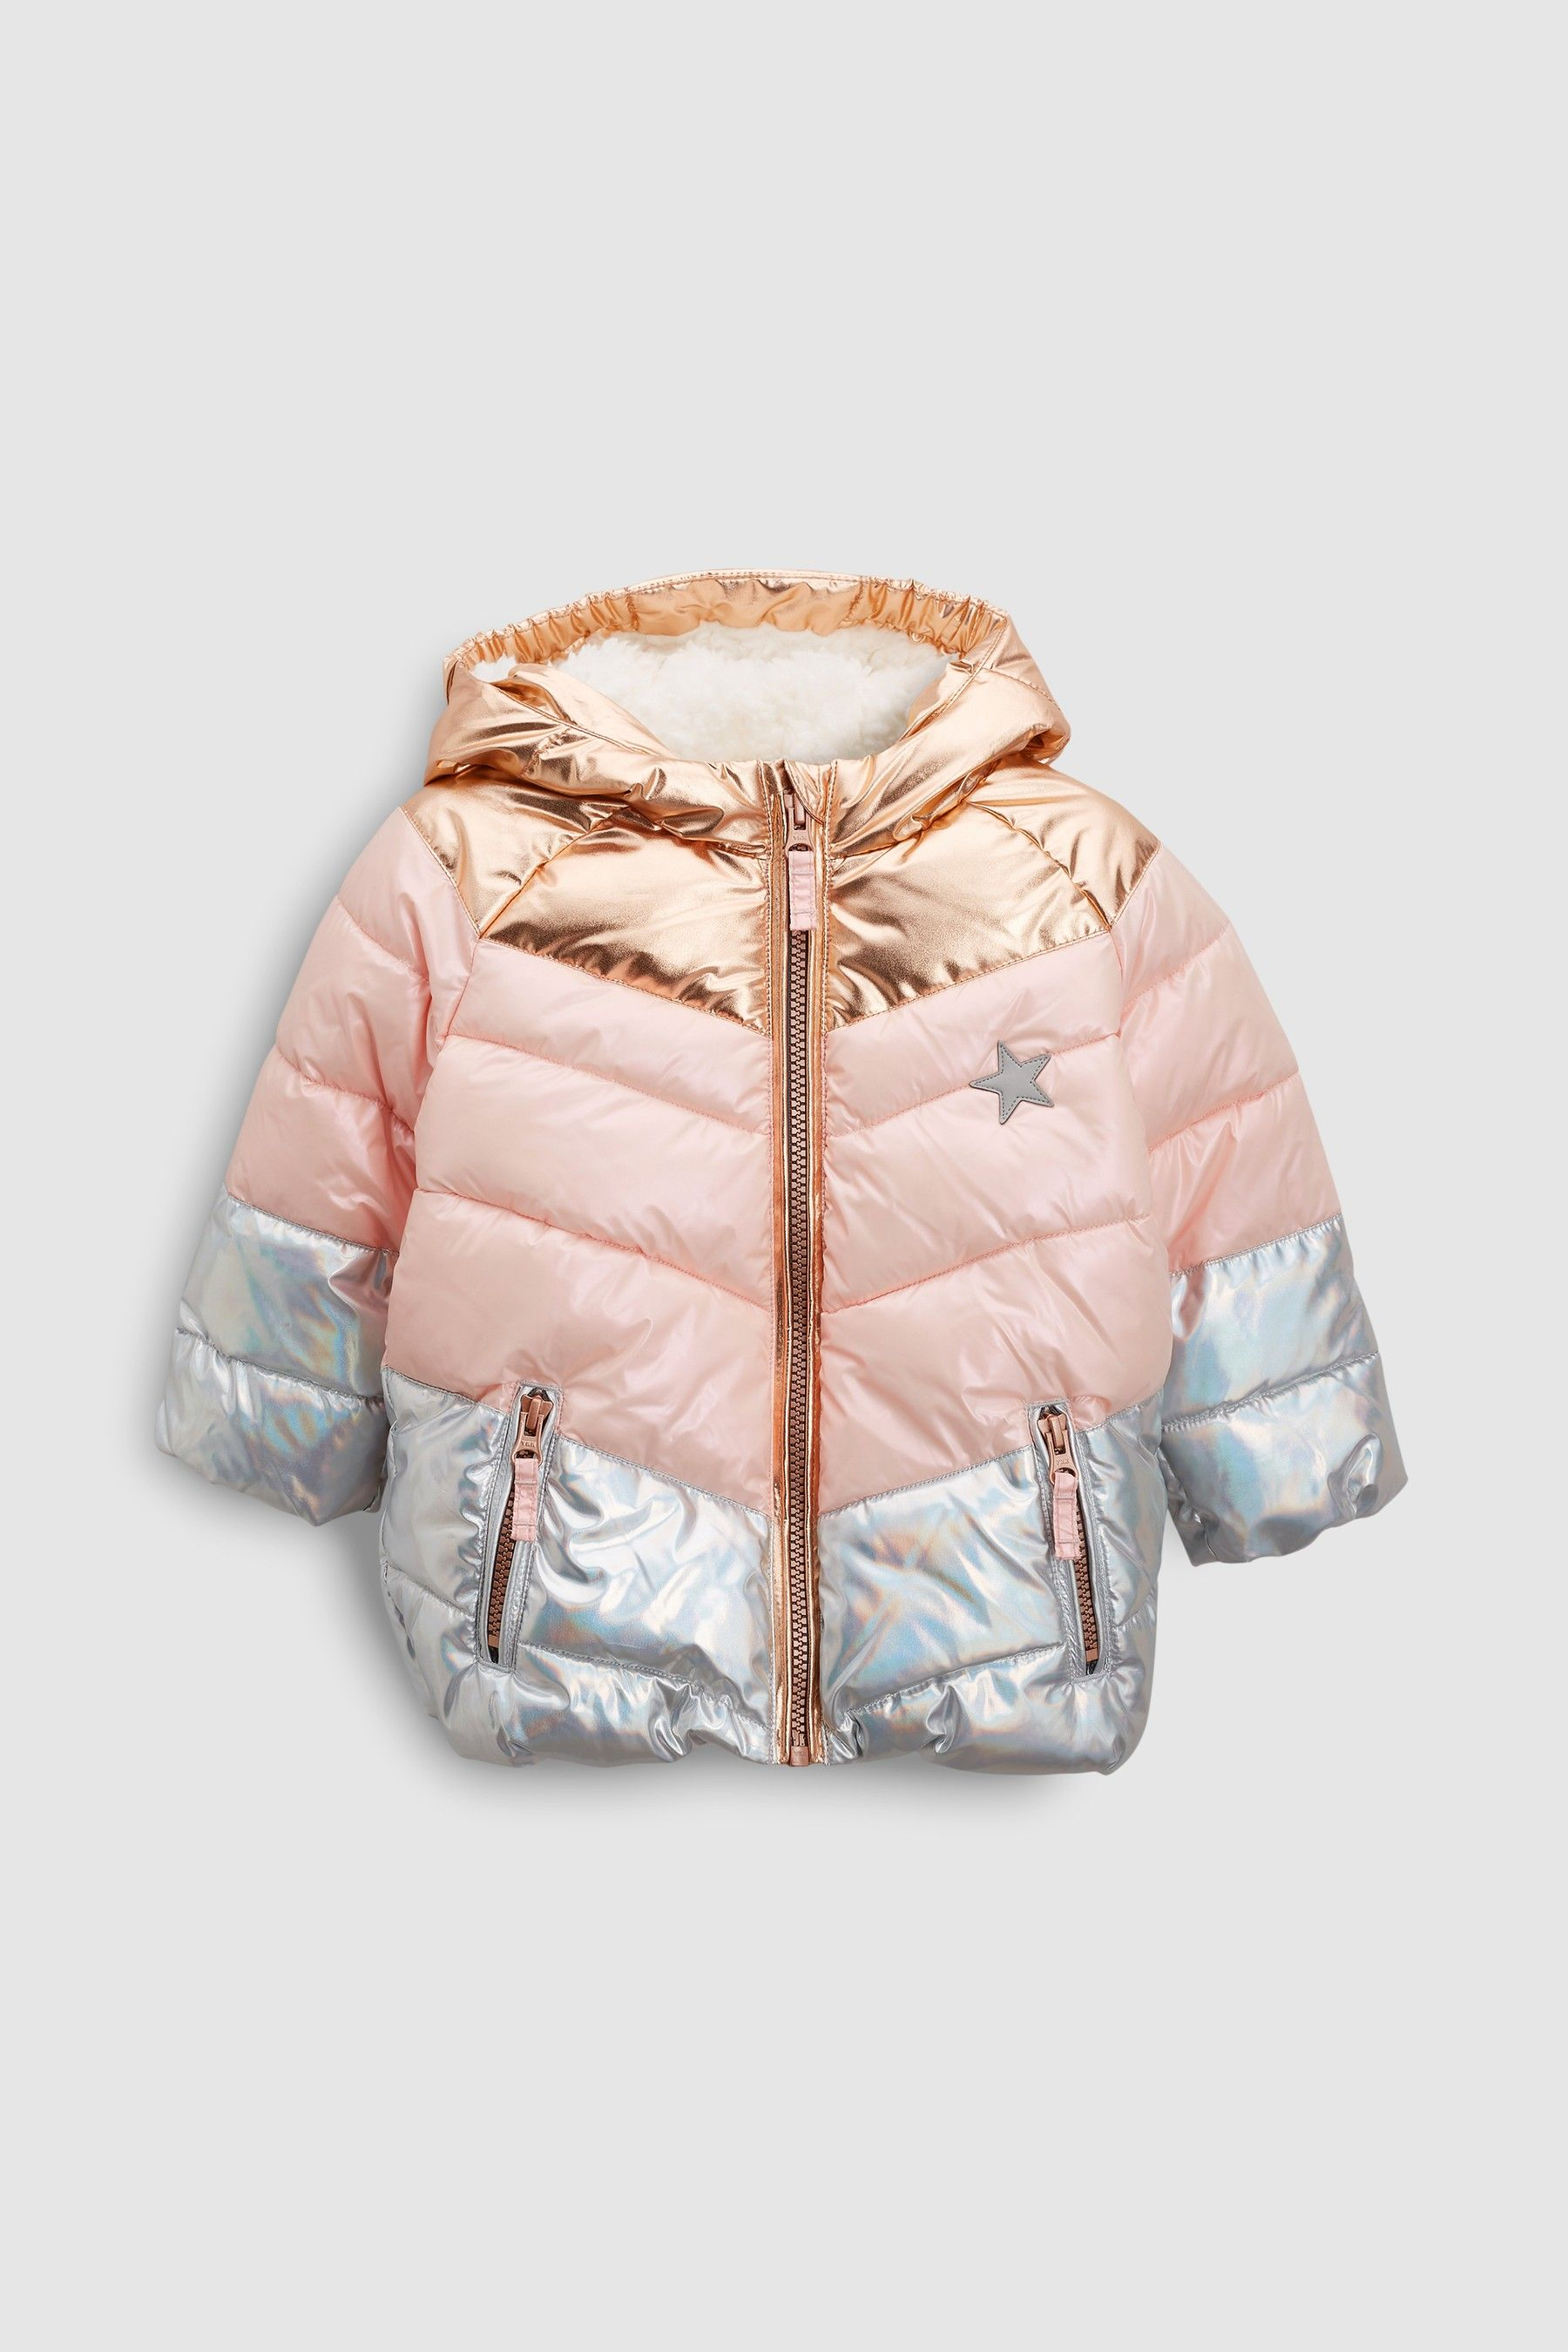 c541e4c5a8e7 Girls Next Pink Colourblock Padded Jacket (3mths-6yrs) - Pink ...